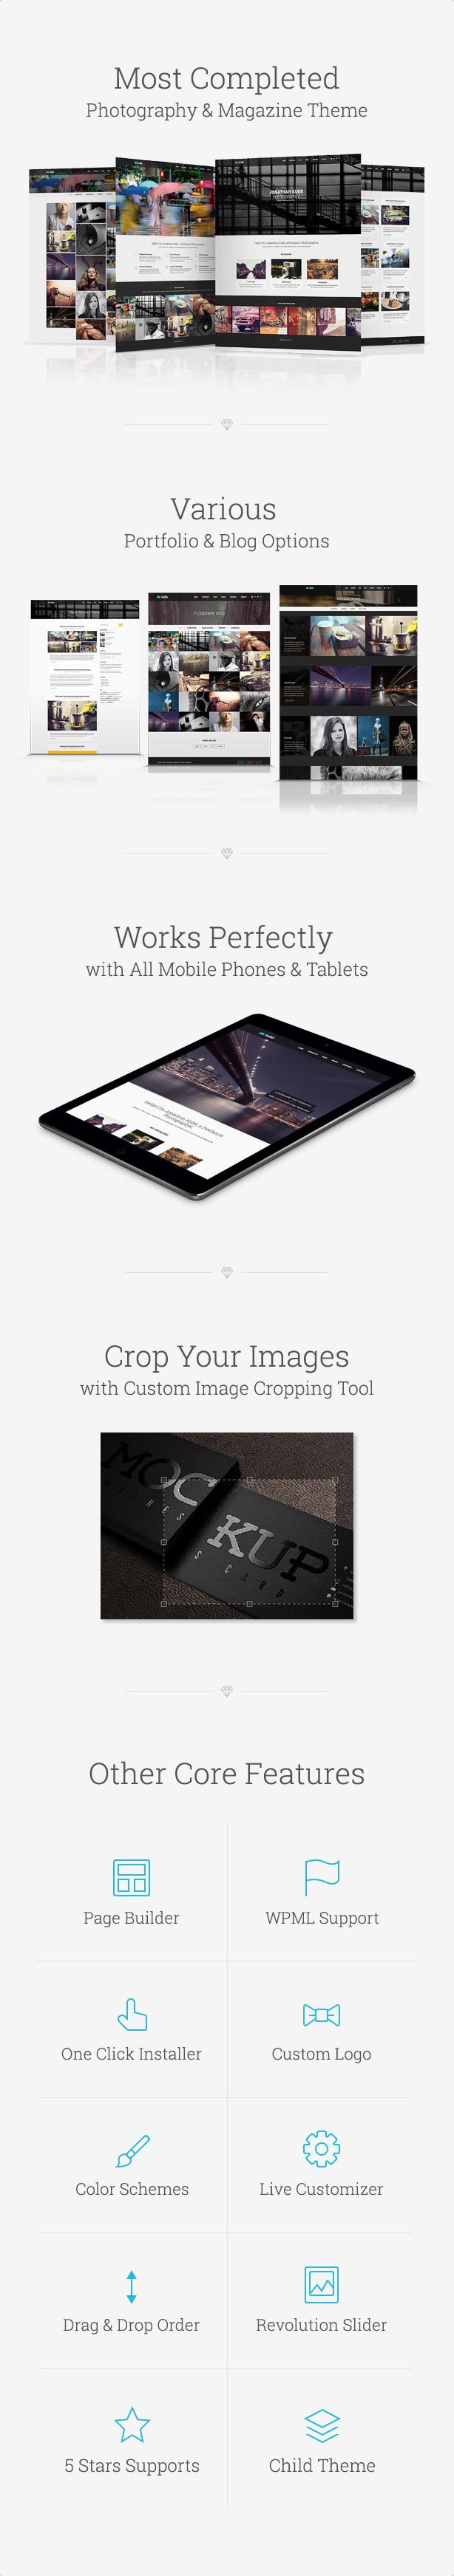 kubb2 - Kubb - Photography & Magazine WordPress Theme